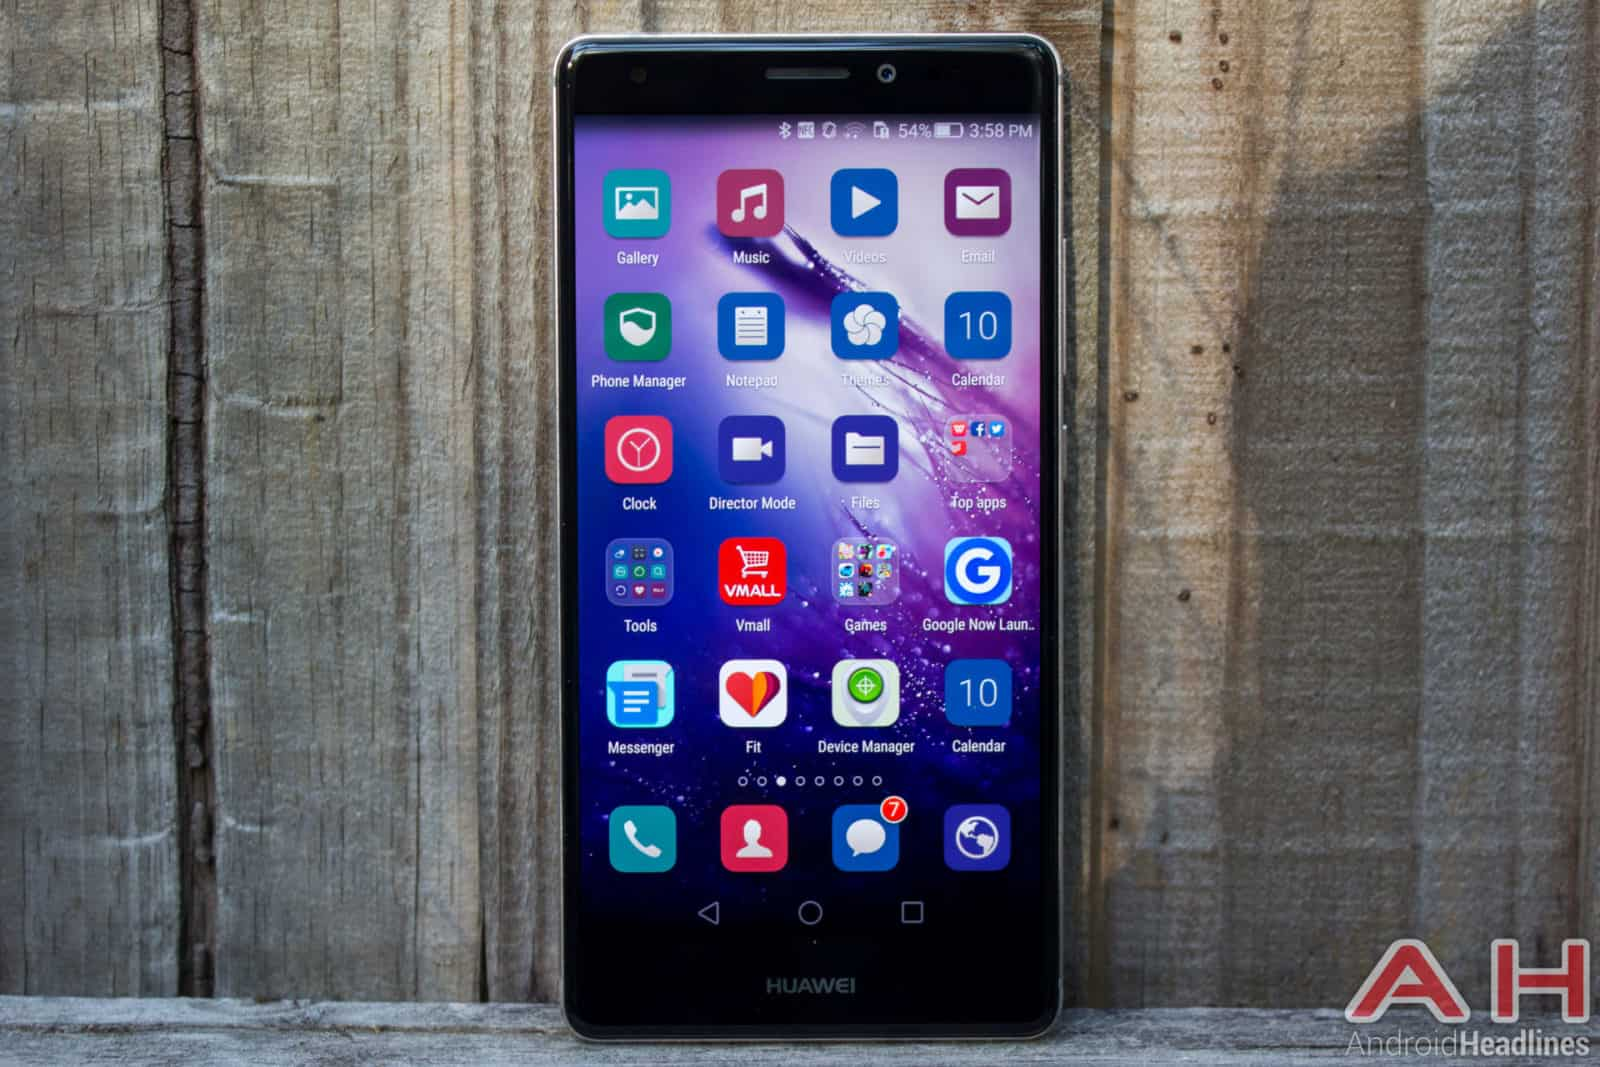 Huawei-Mate-S-AH-NS-apps